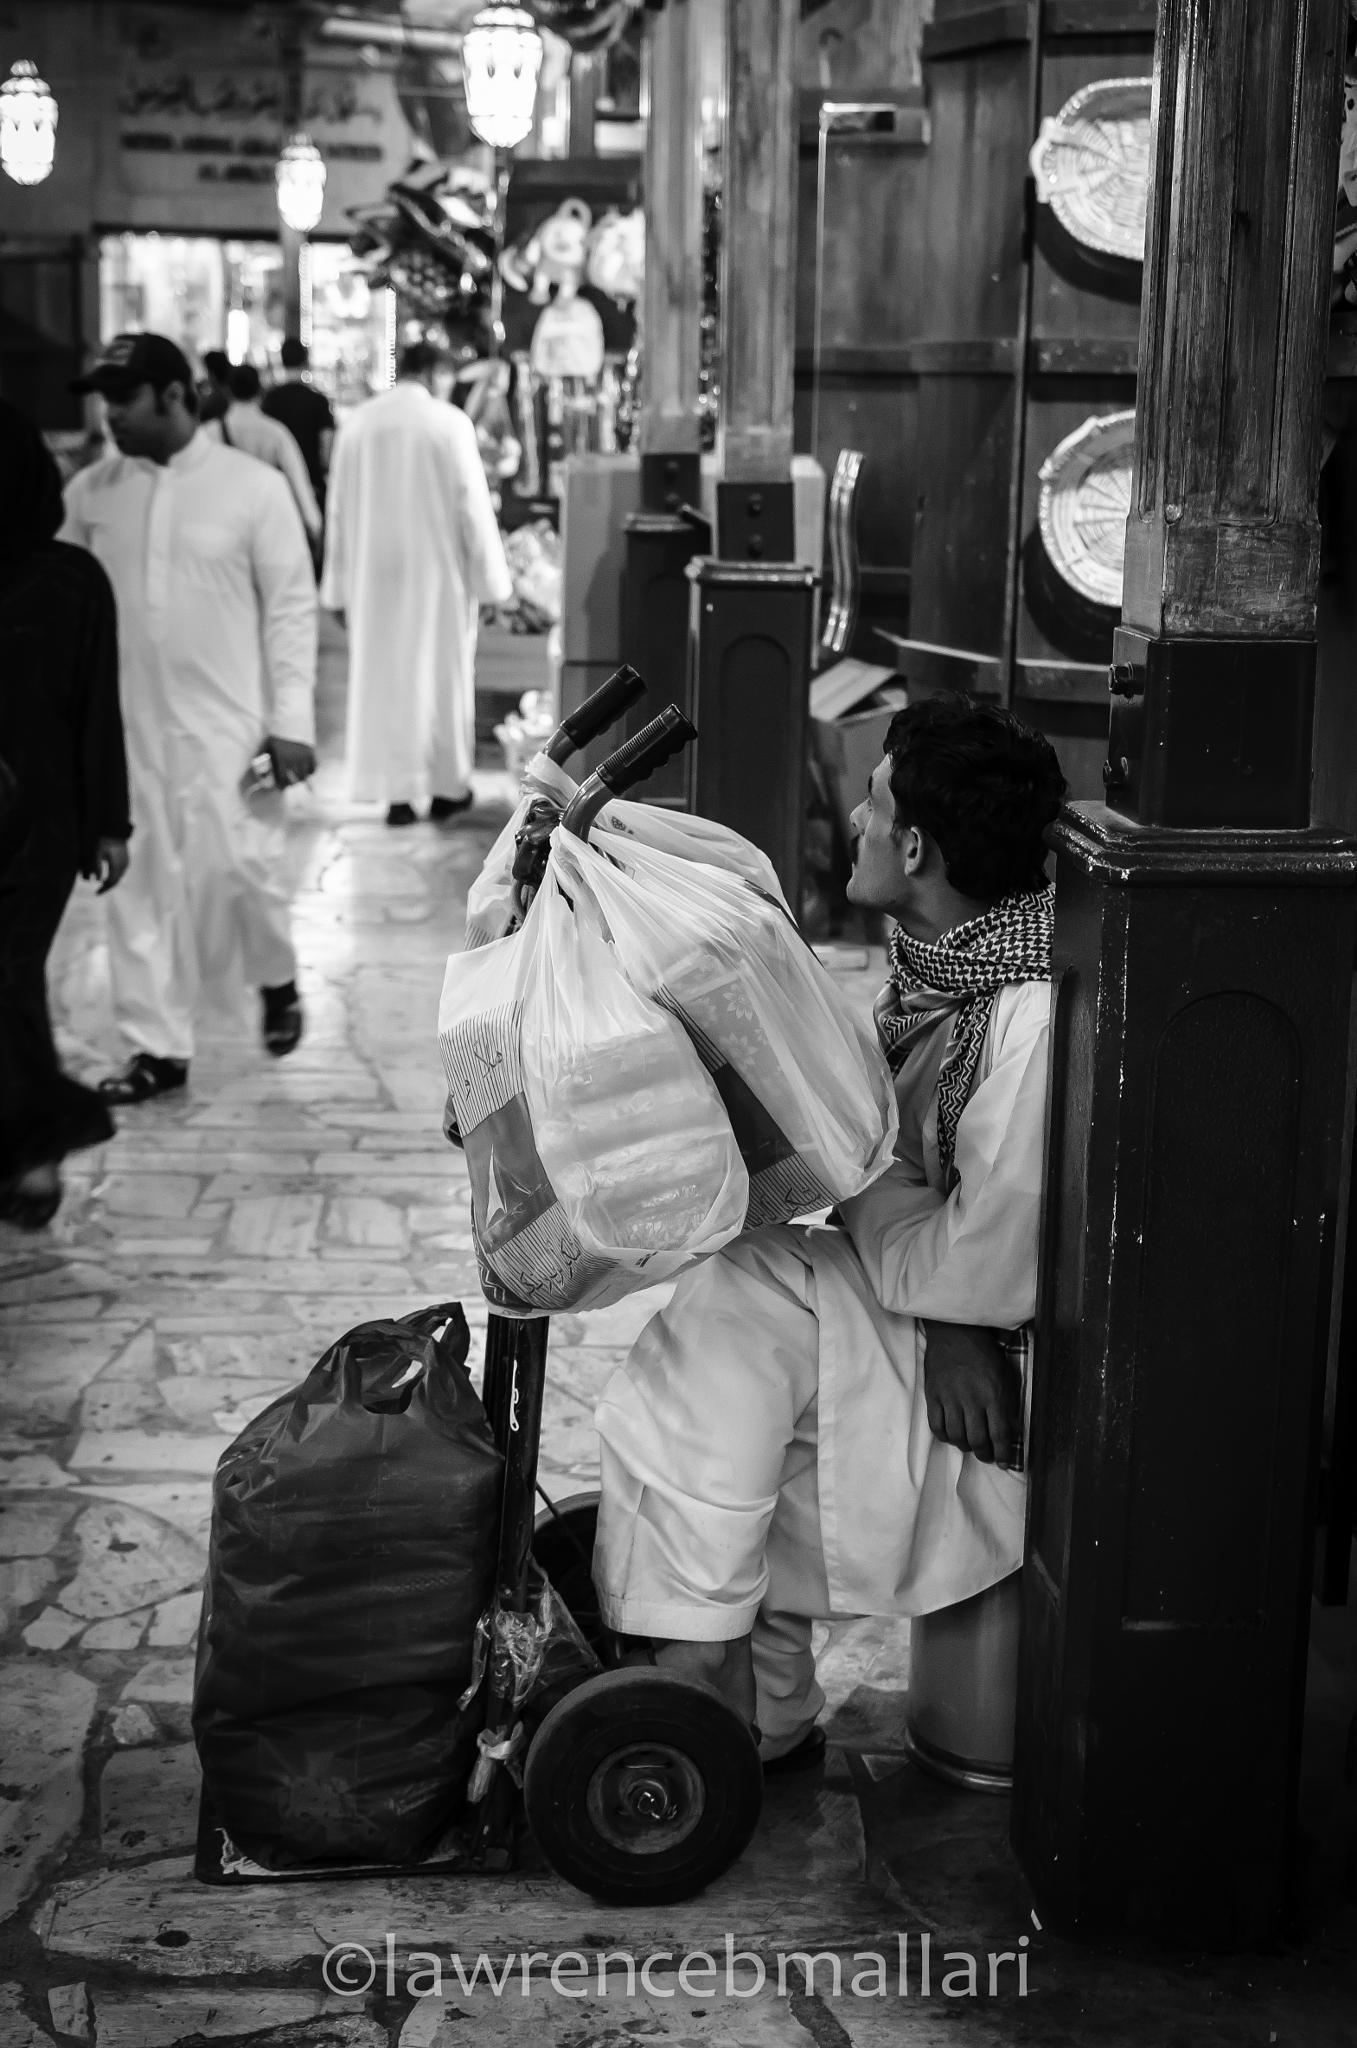 Waiting. by lawrence.b.mallari